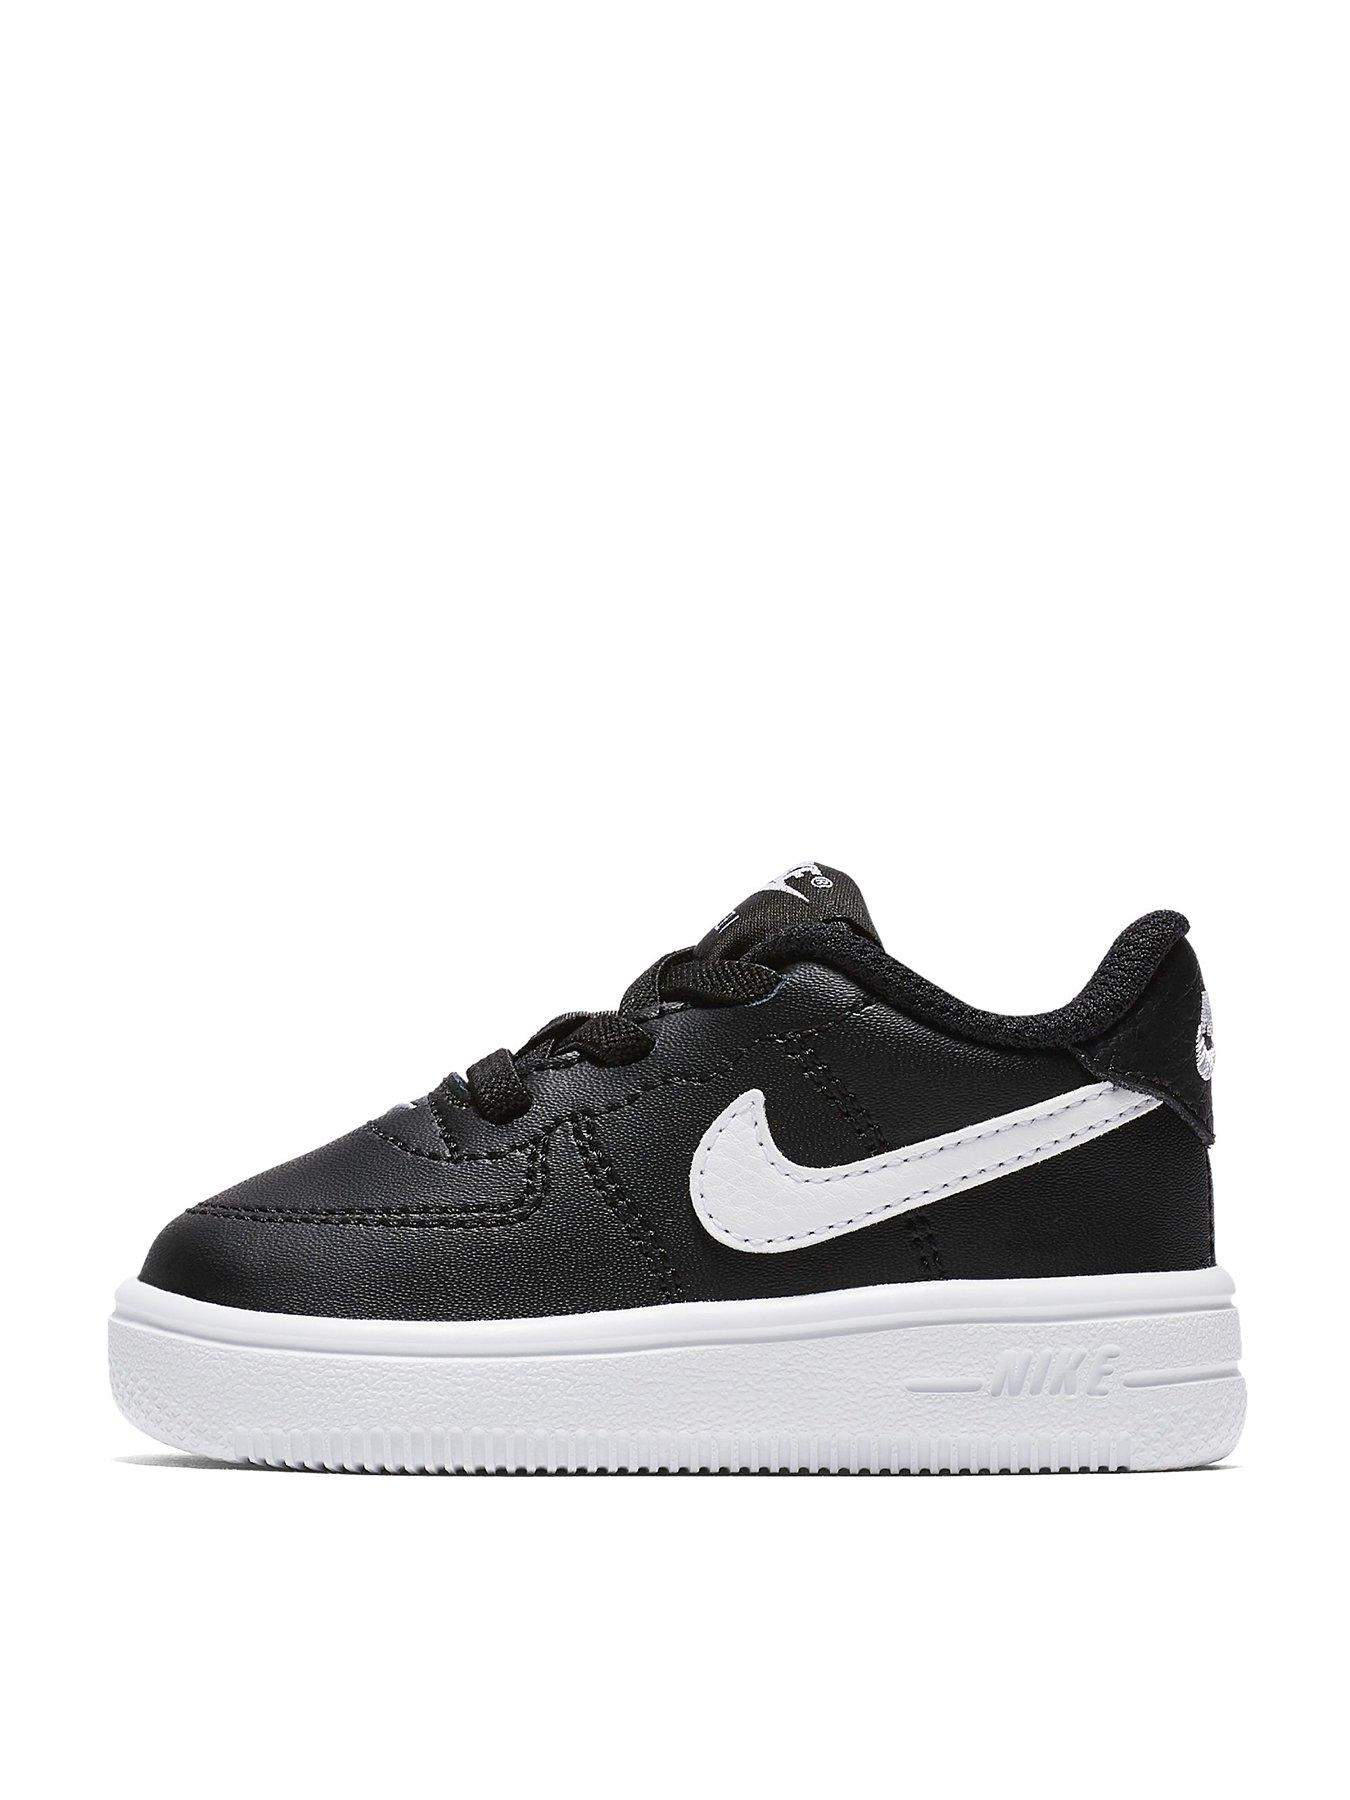 1Kidsamp; Shoes Www Nike Leisure Force Air Baby Sports 0XnOwPk8